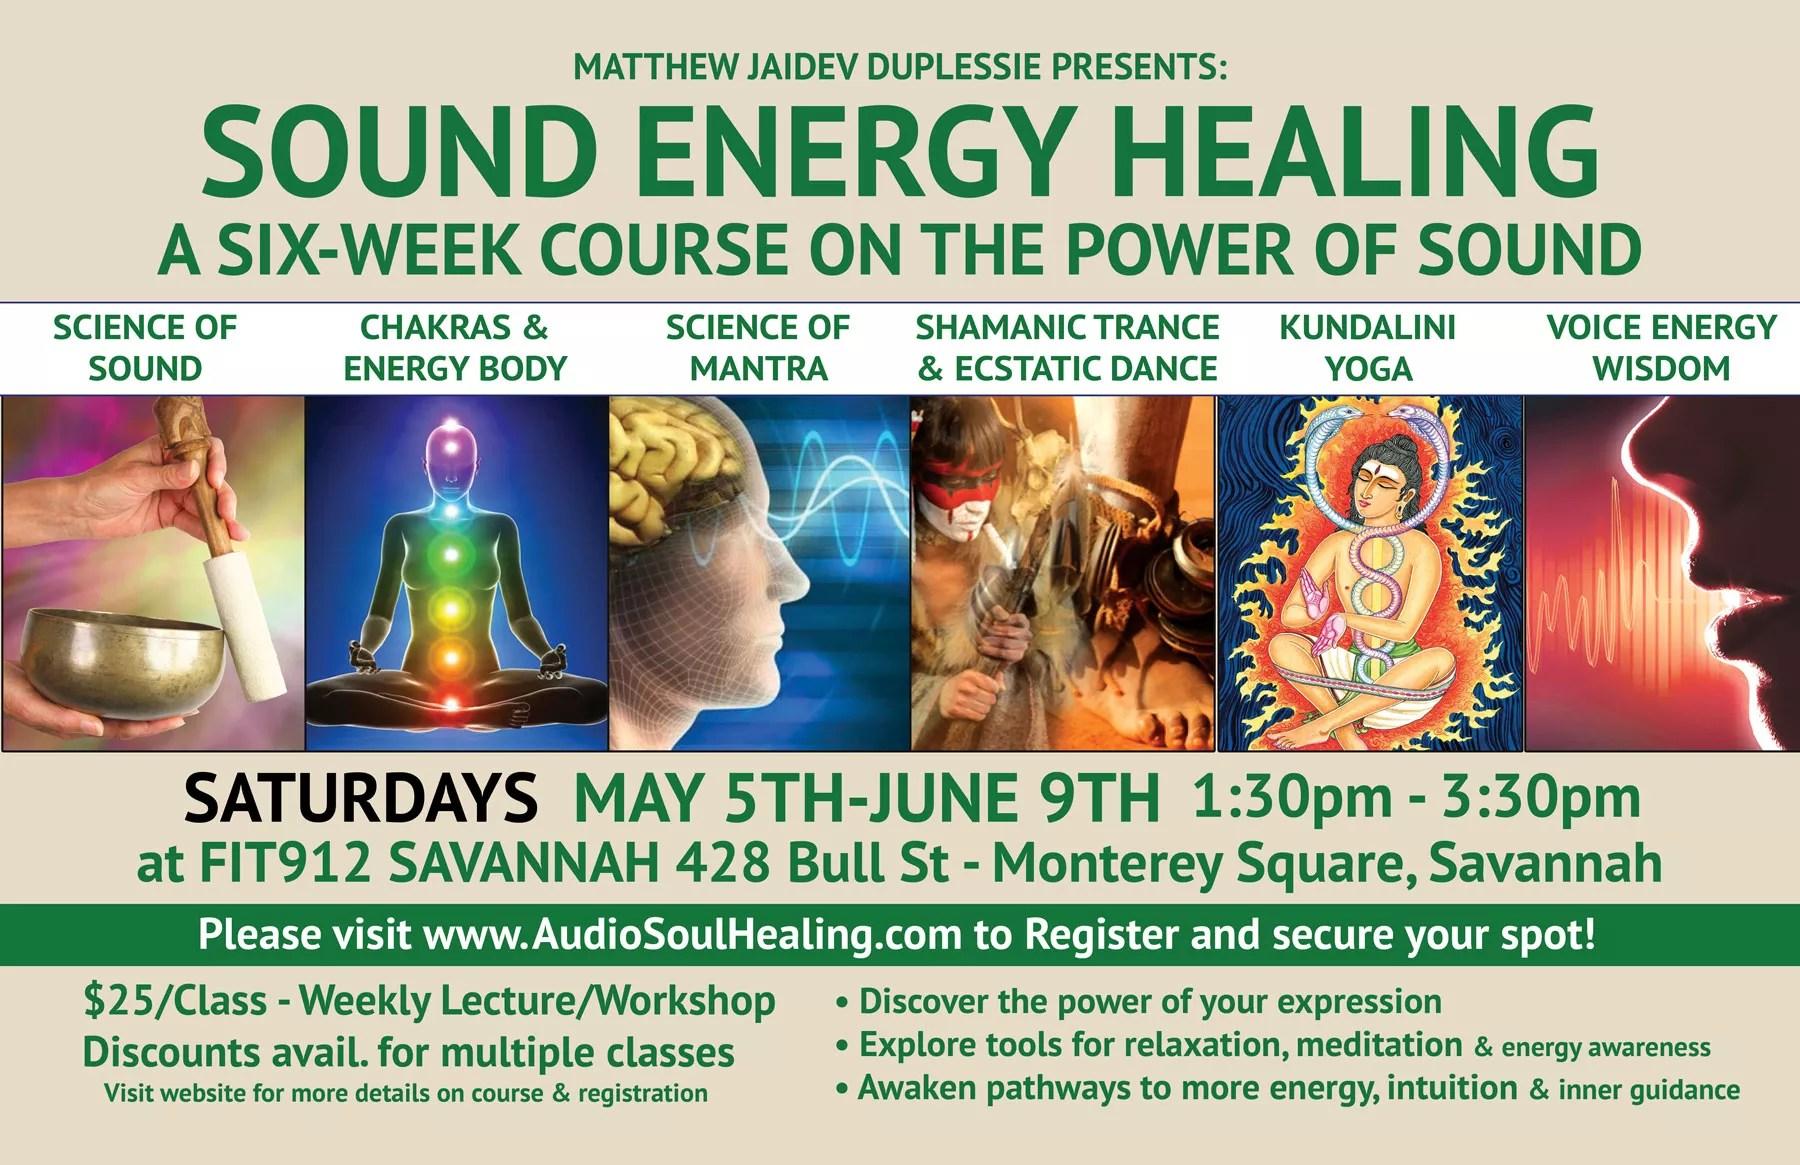 2018 - 6 Week Sound Energy Healing Course | AudioSoul Healing